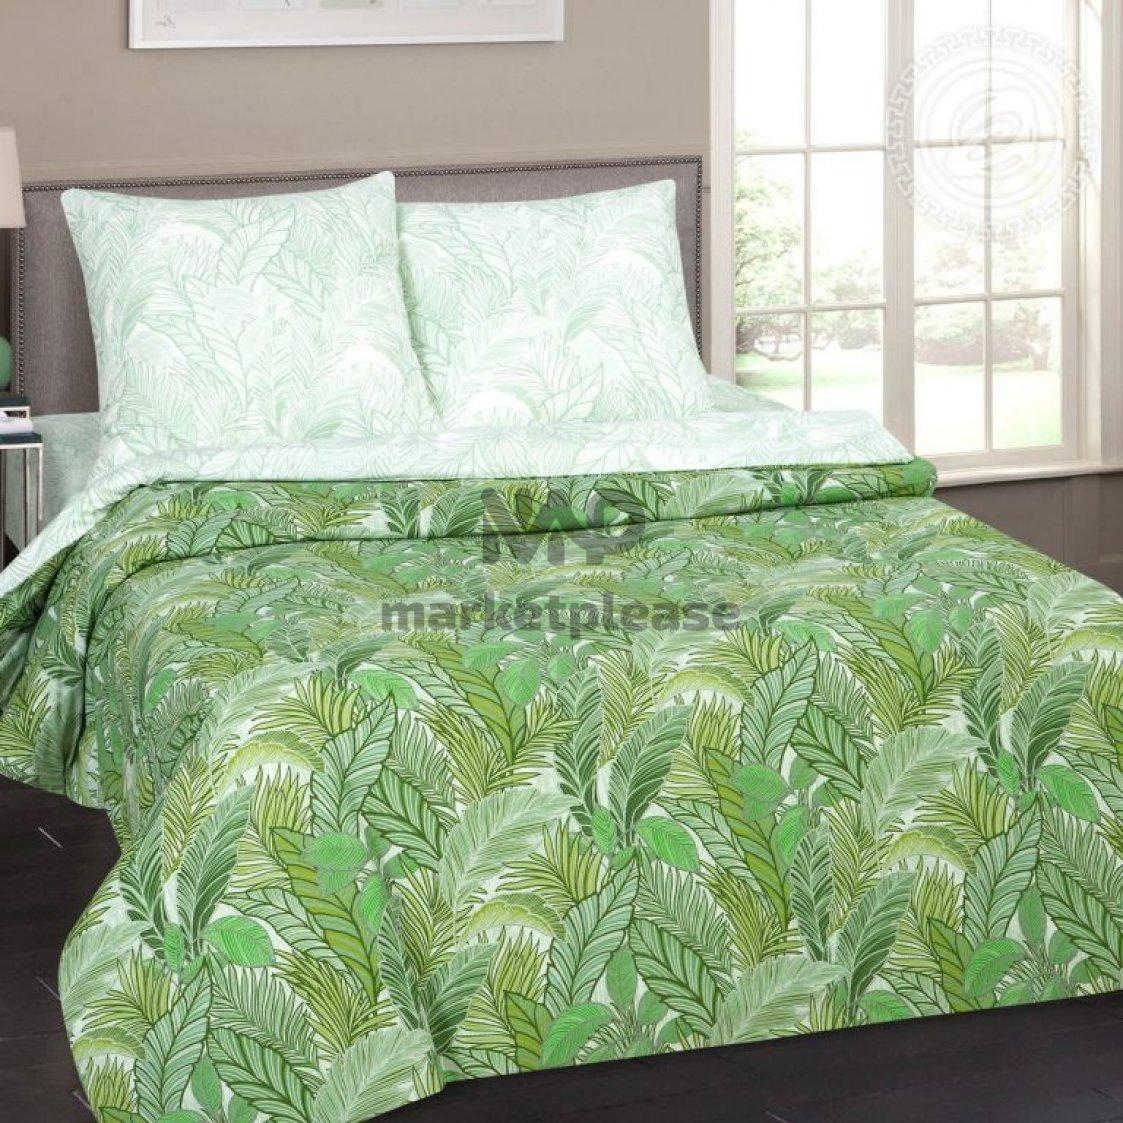 "Рулон ткани поплин ""Джунгли"" 220 см."